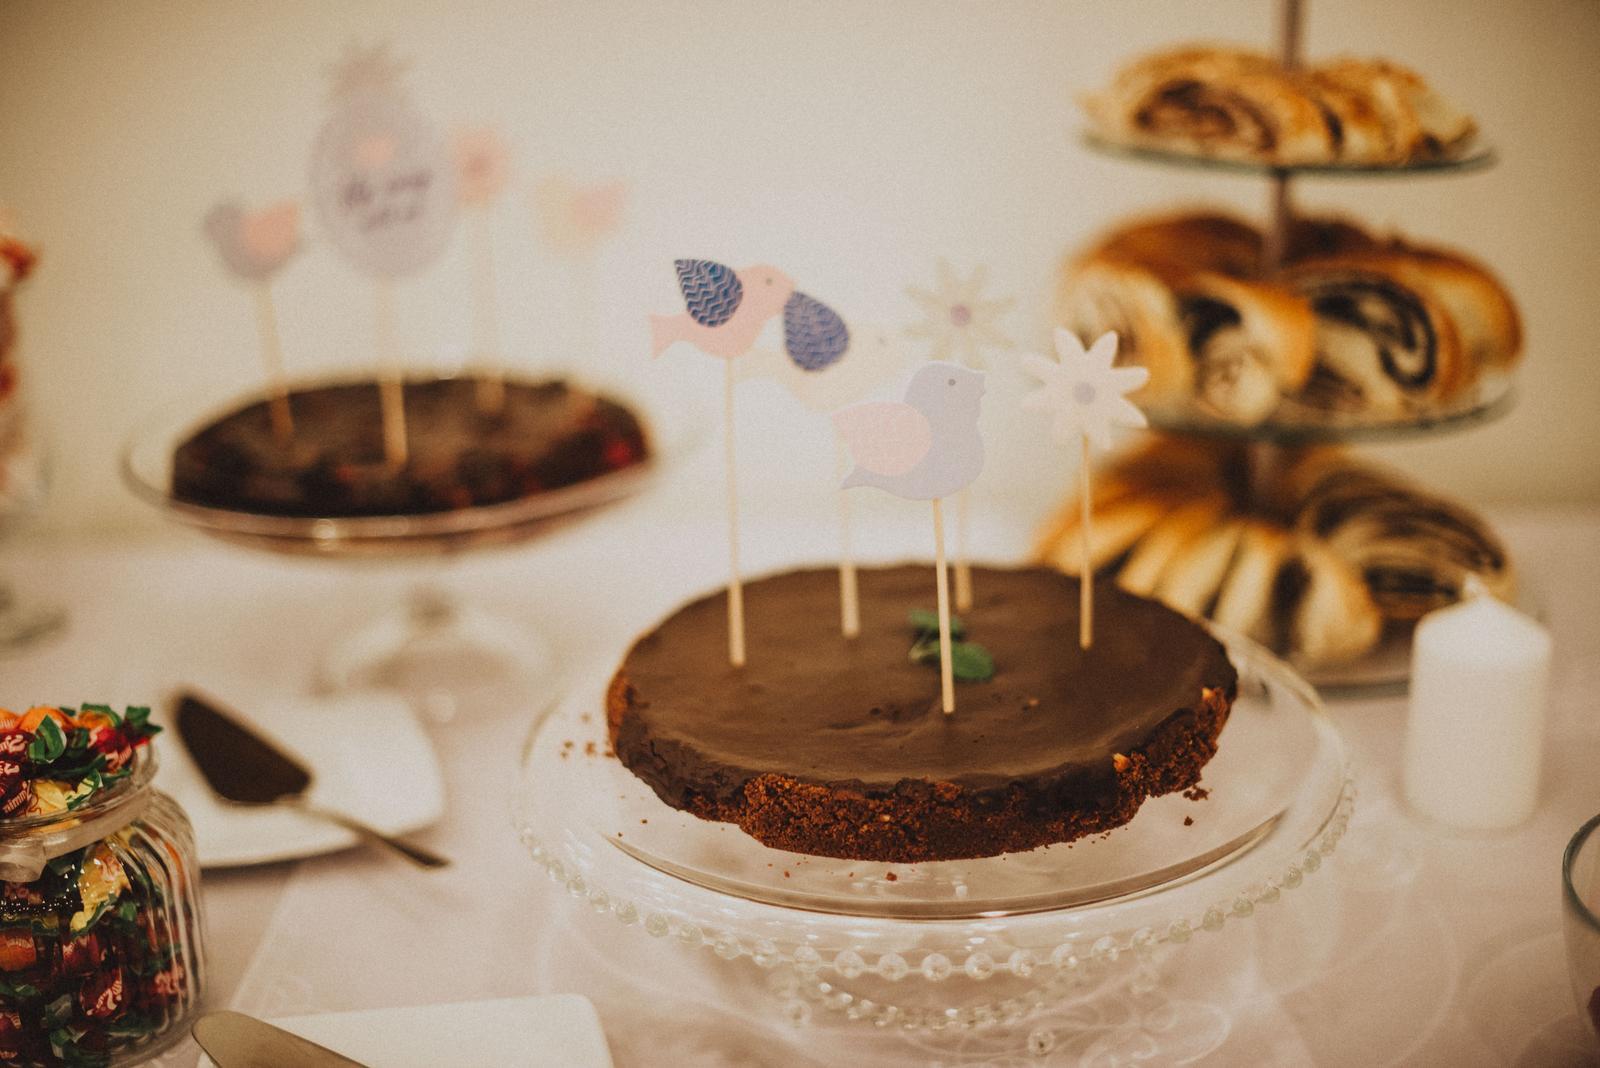 Tatranská zimná svadba - mamkine nesmierne výtečné cheesecaky